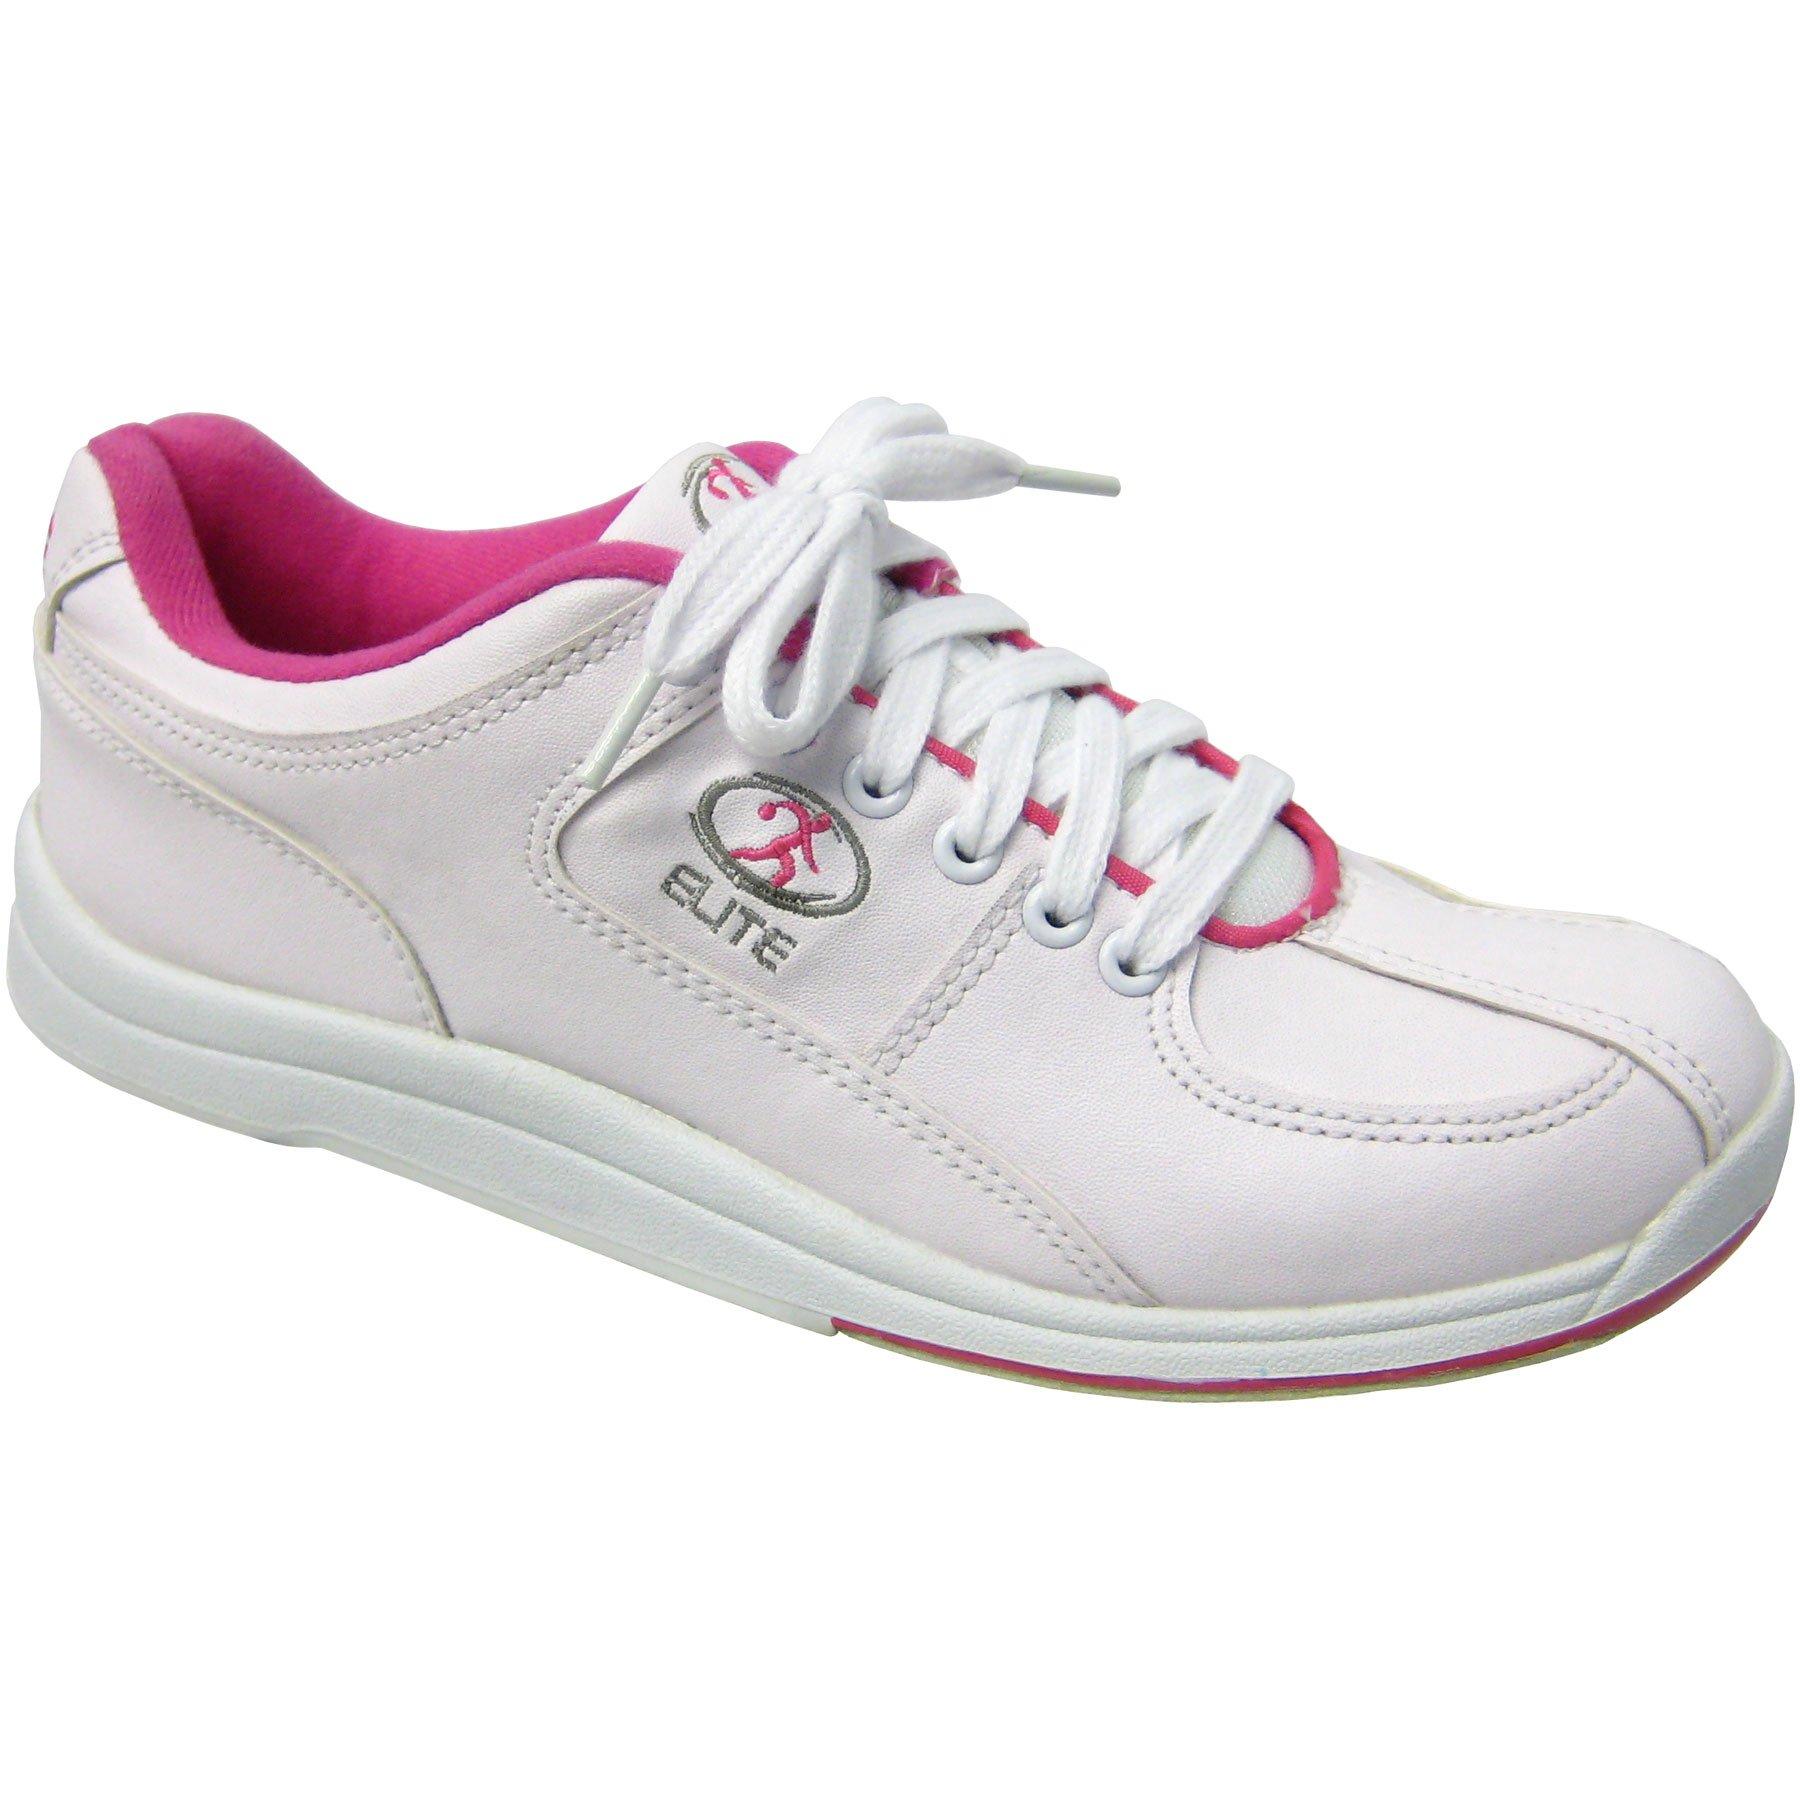 Elite Ariel White/Pink - Womens 7.5